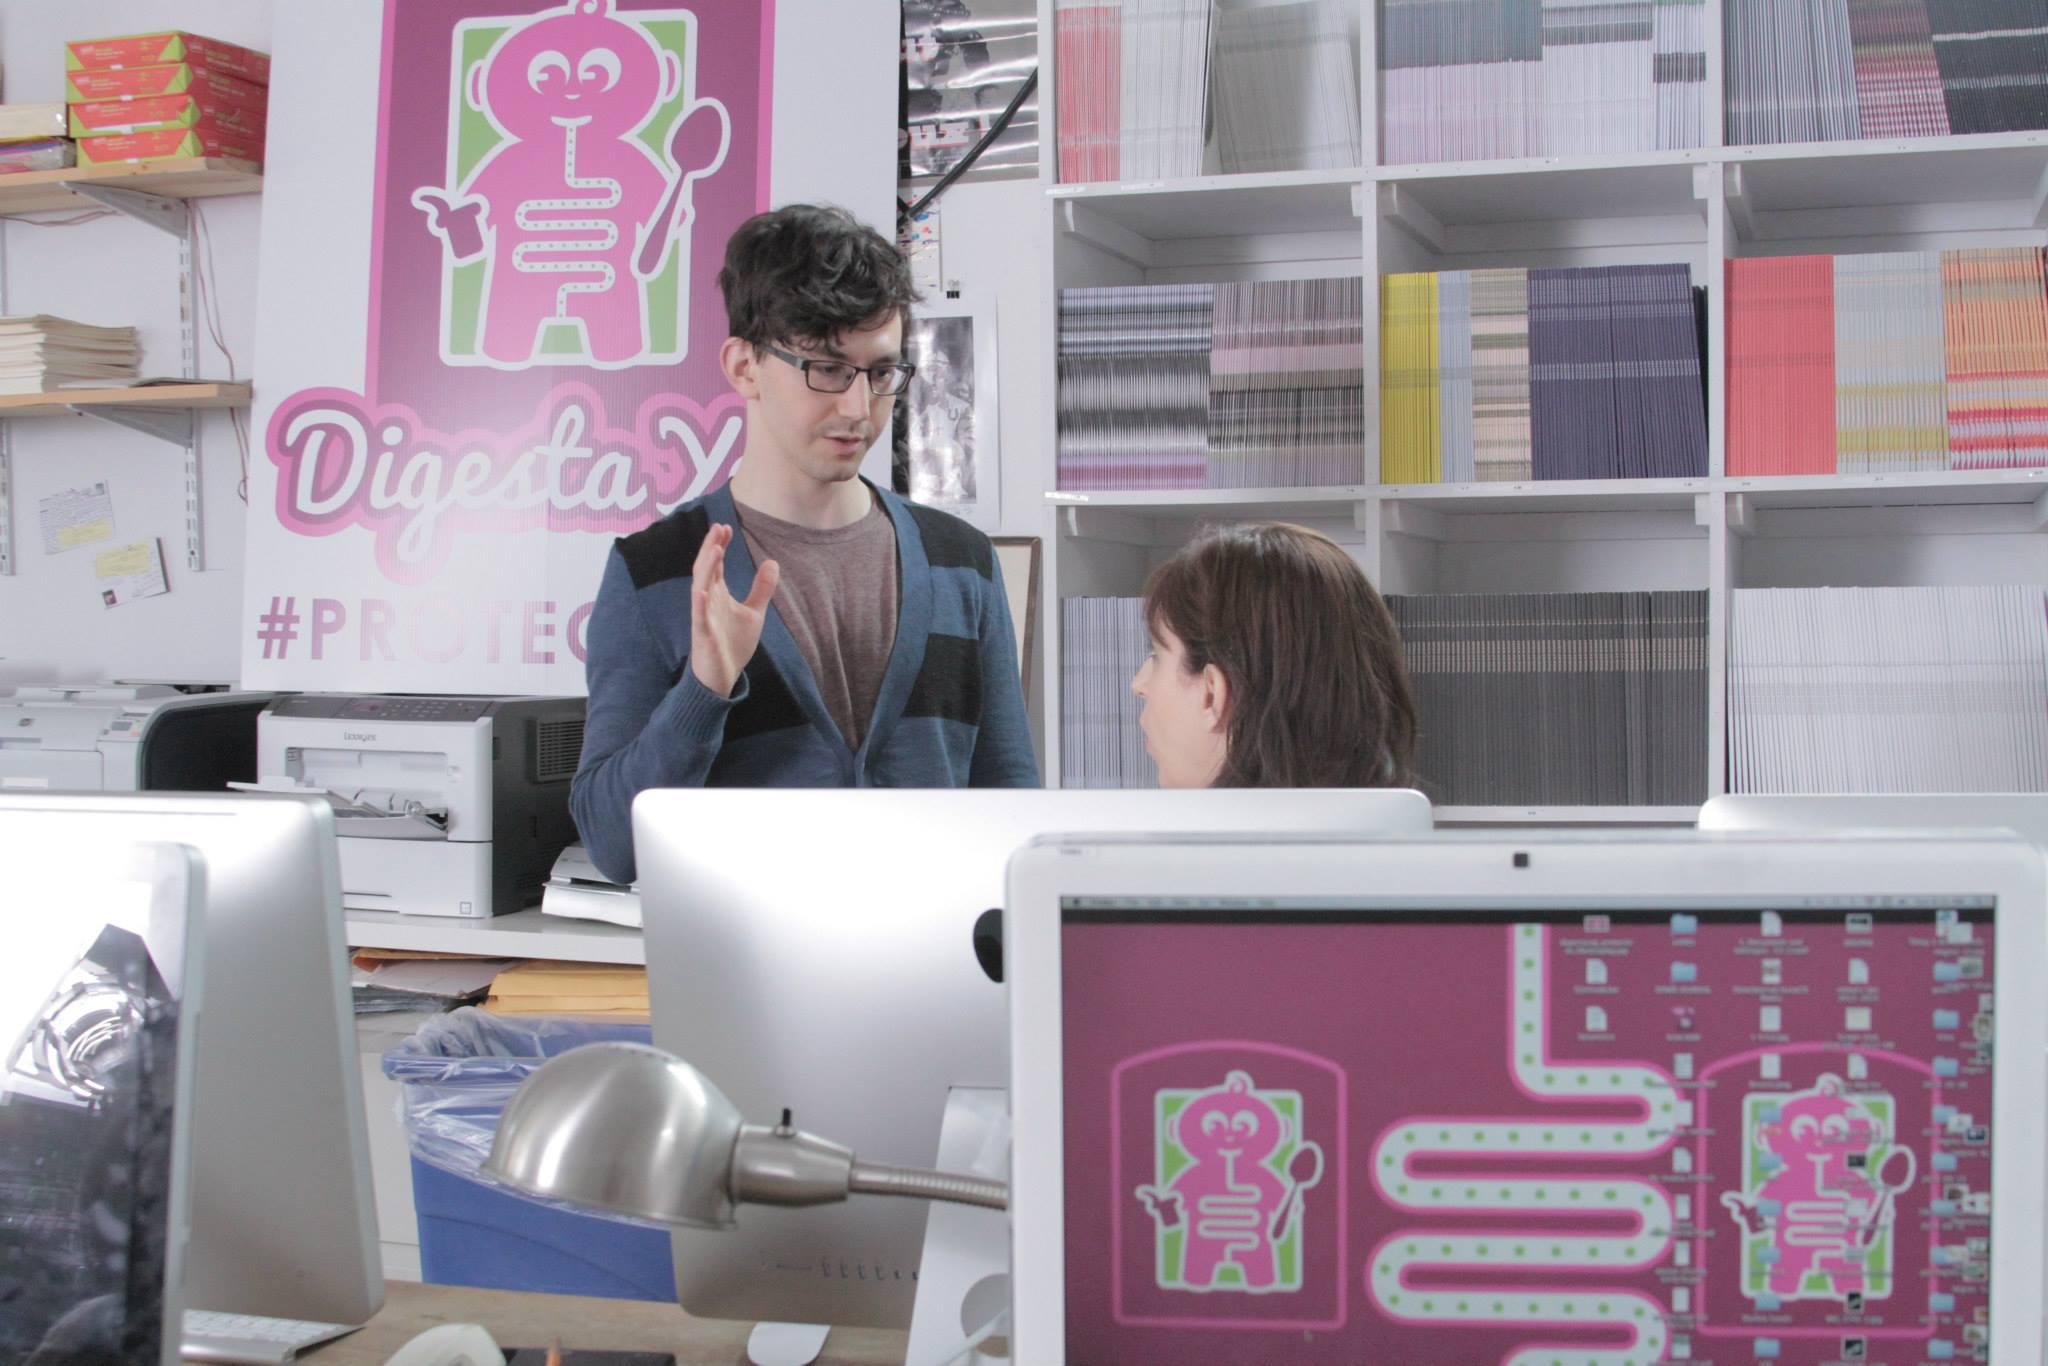 Director Daniel Goldberg imparts wisdom with his hand.